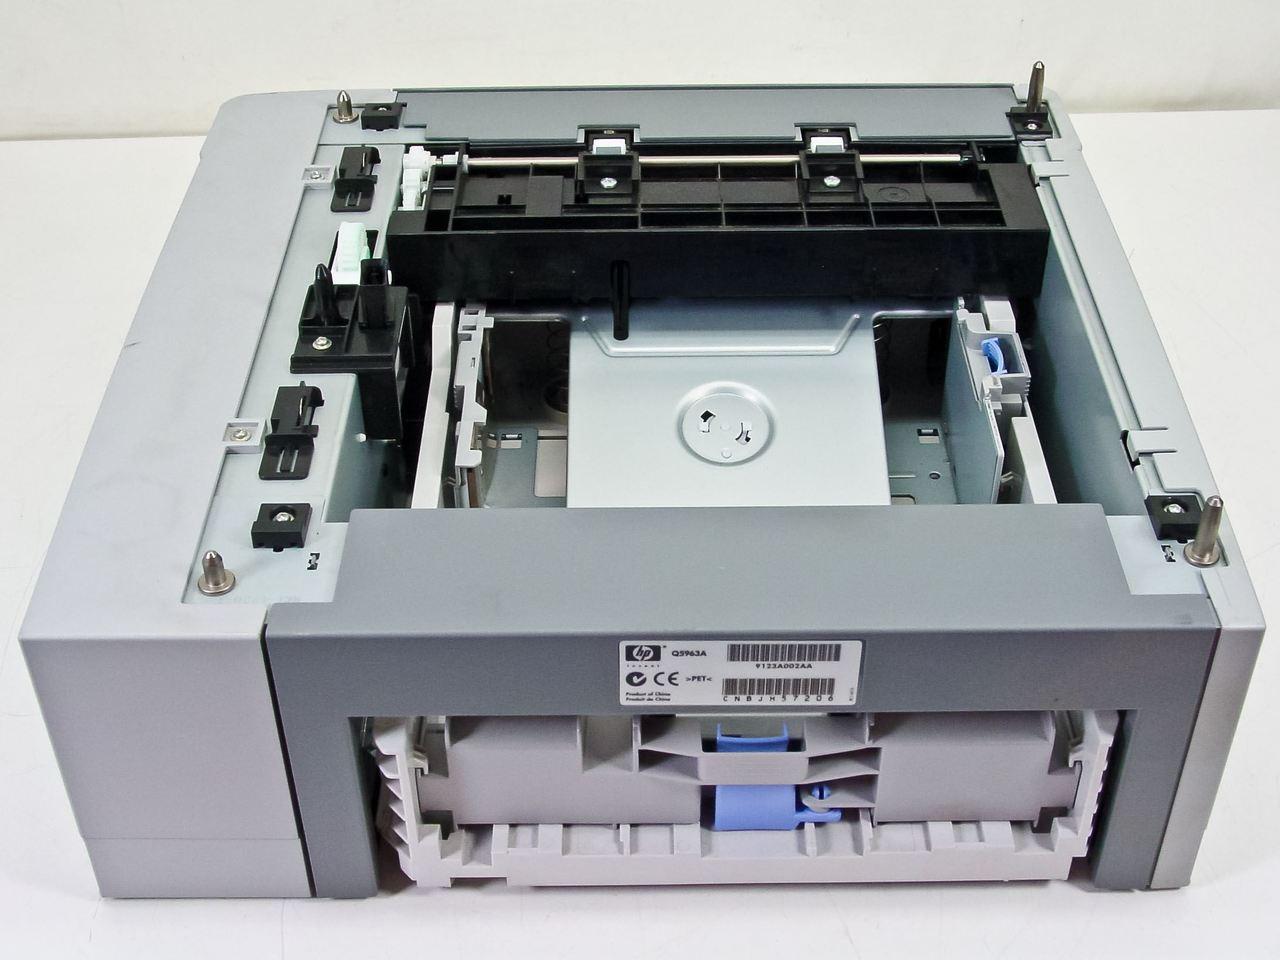 Hp LaserJet 2400 Series 500 Sheet Feeder Q5963A